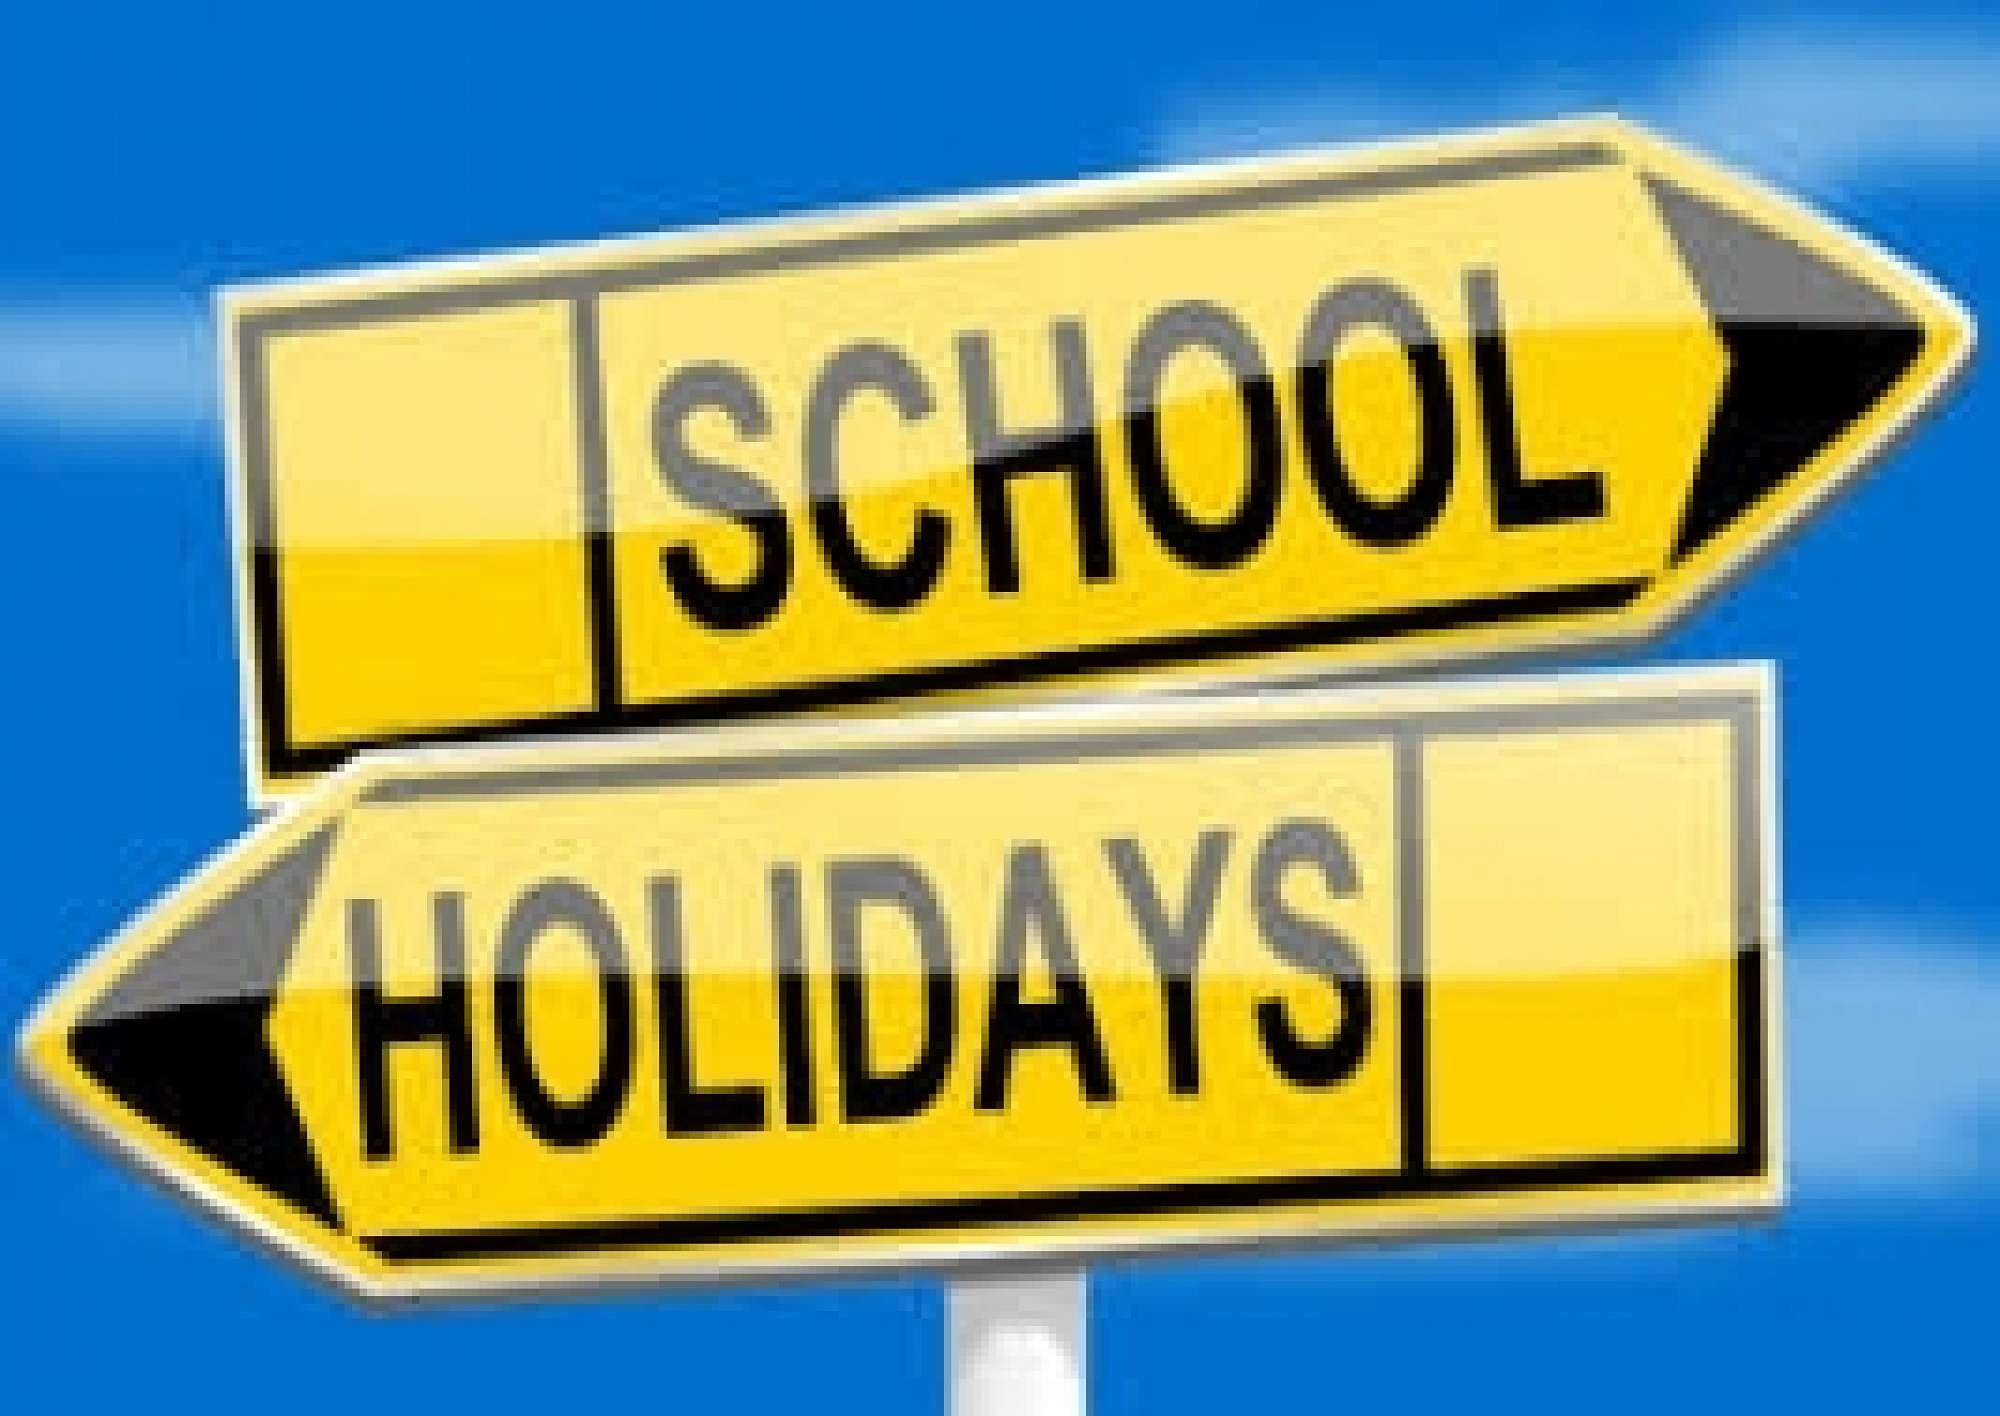 School holidays brought forward